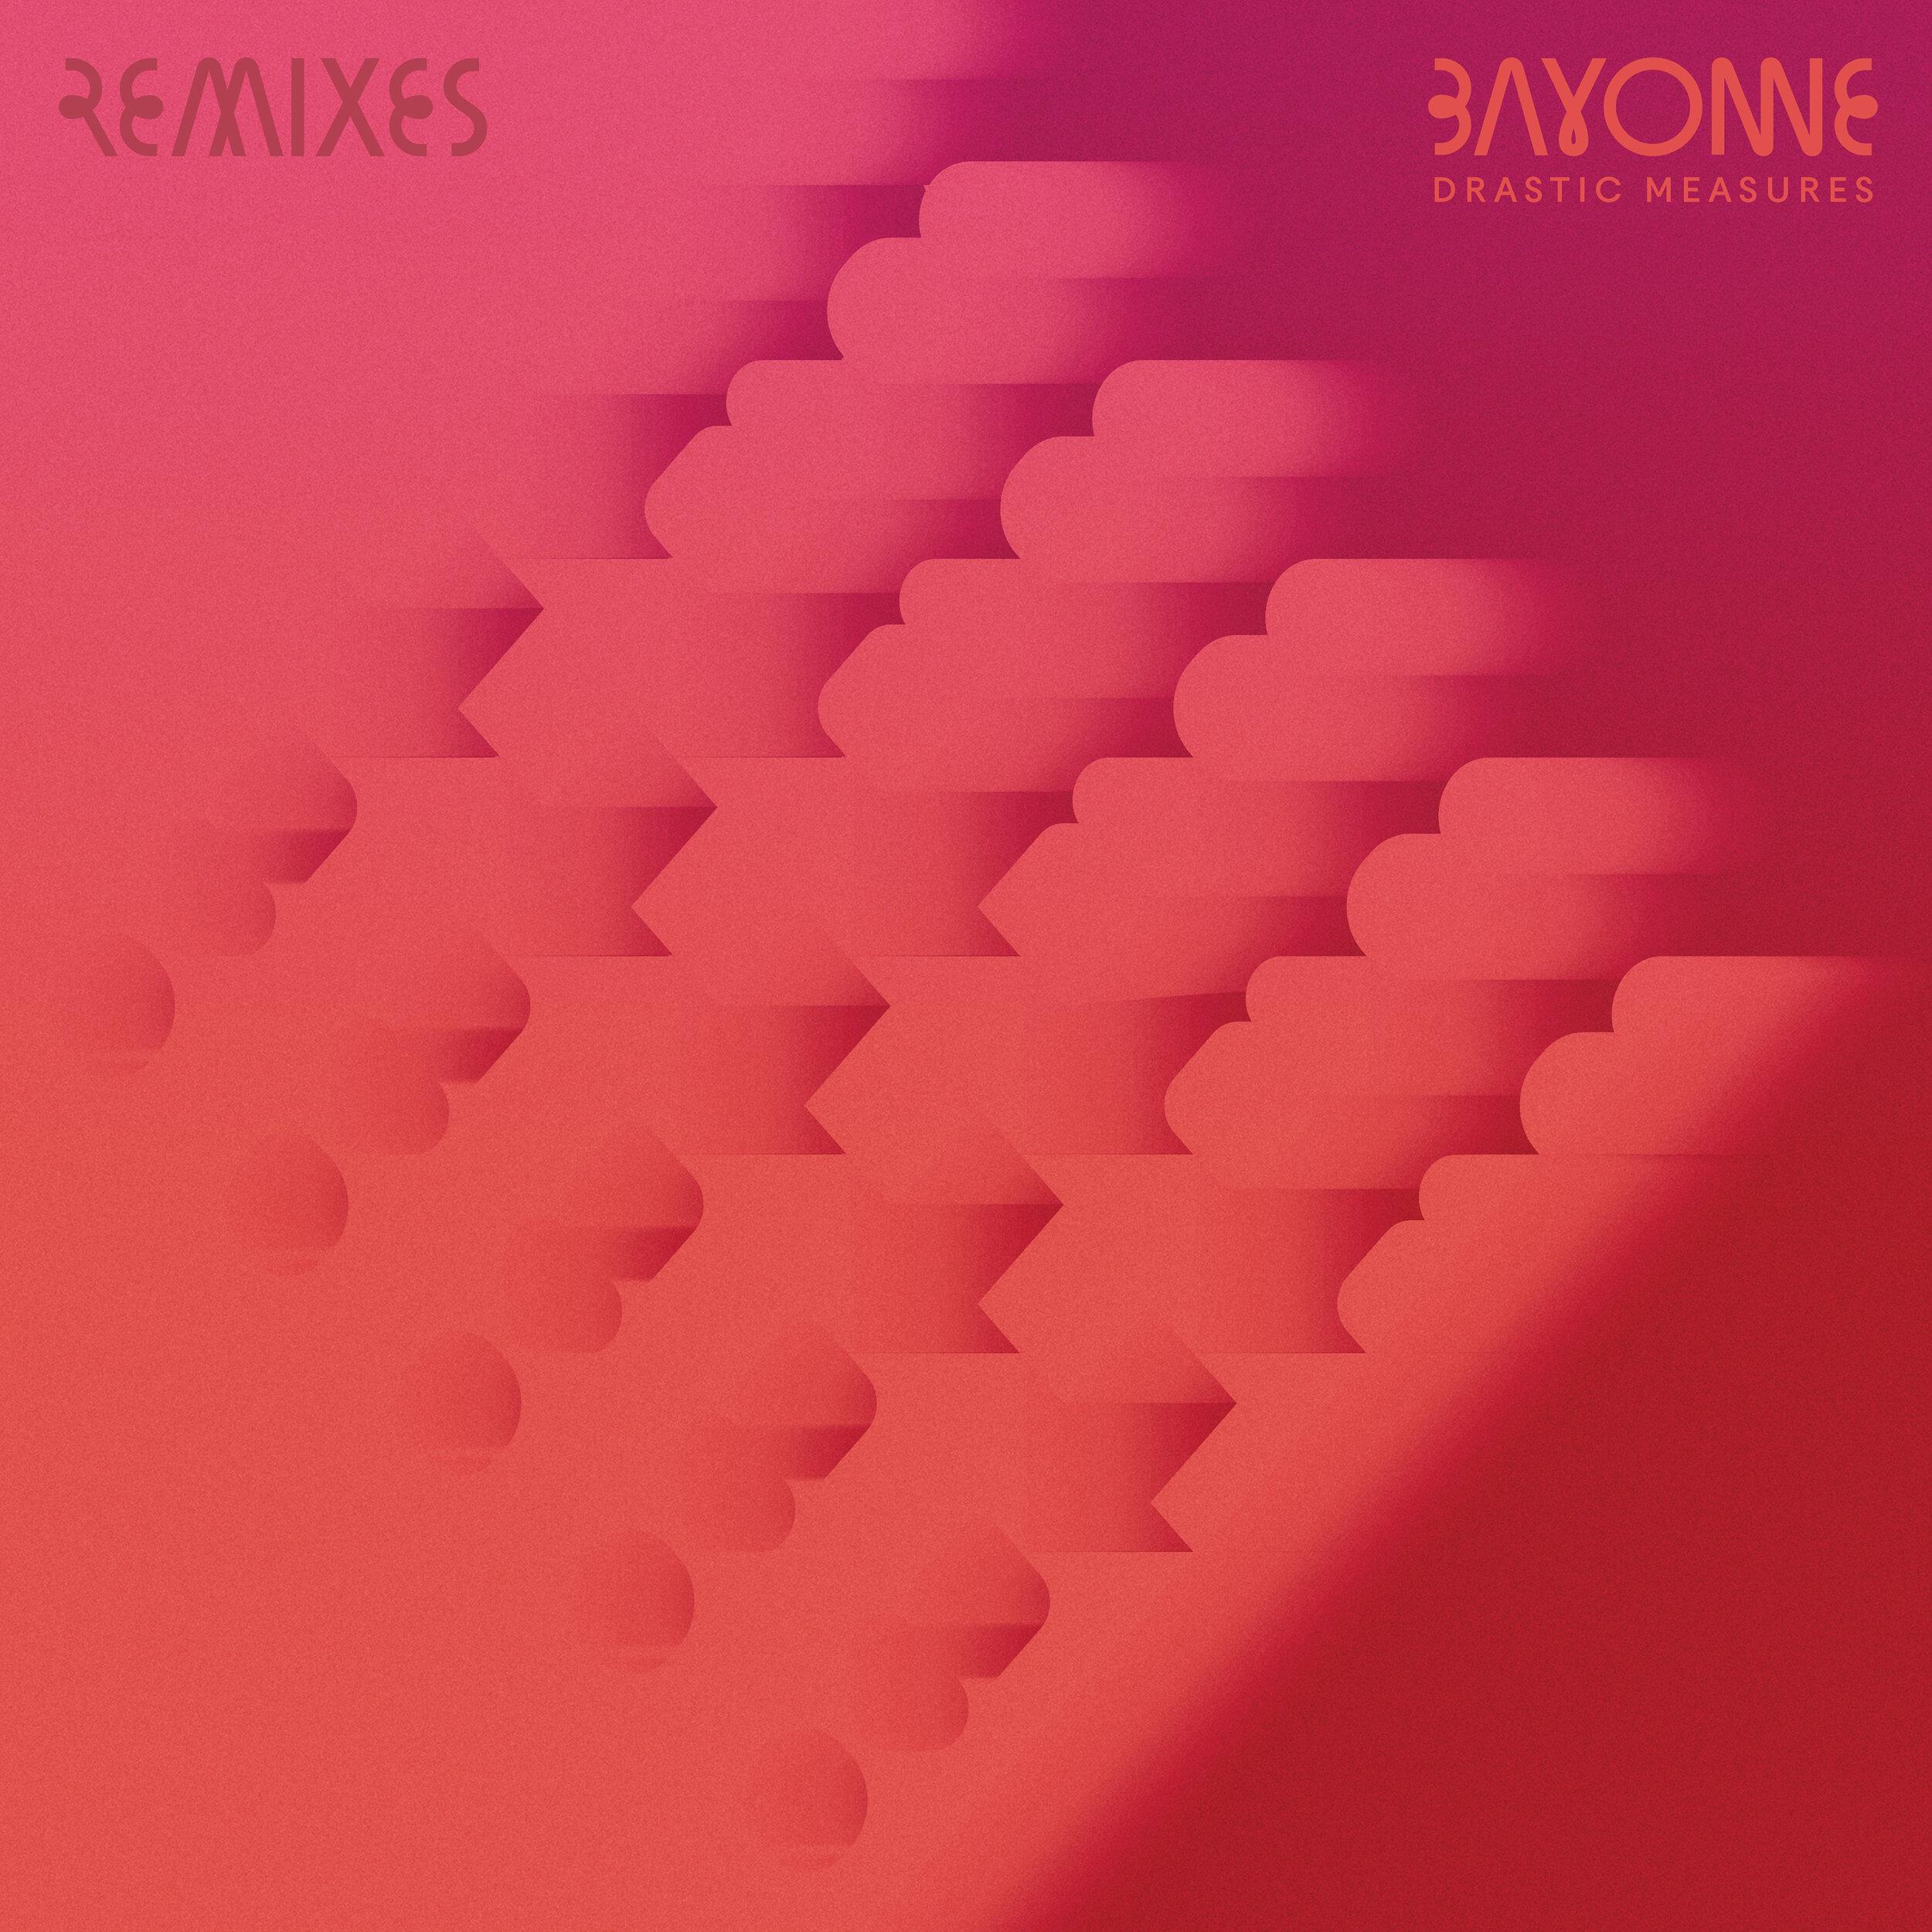 Bayonne_DM_Remixes_Cover_F_RGB_3000x3000.jpg